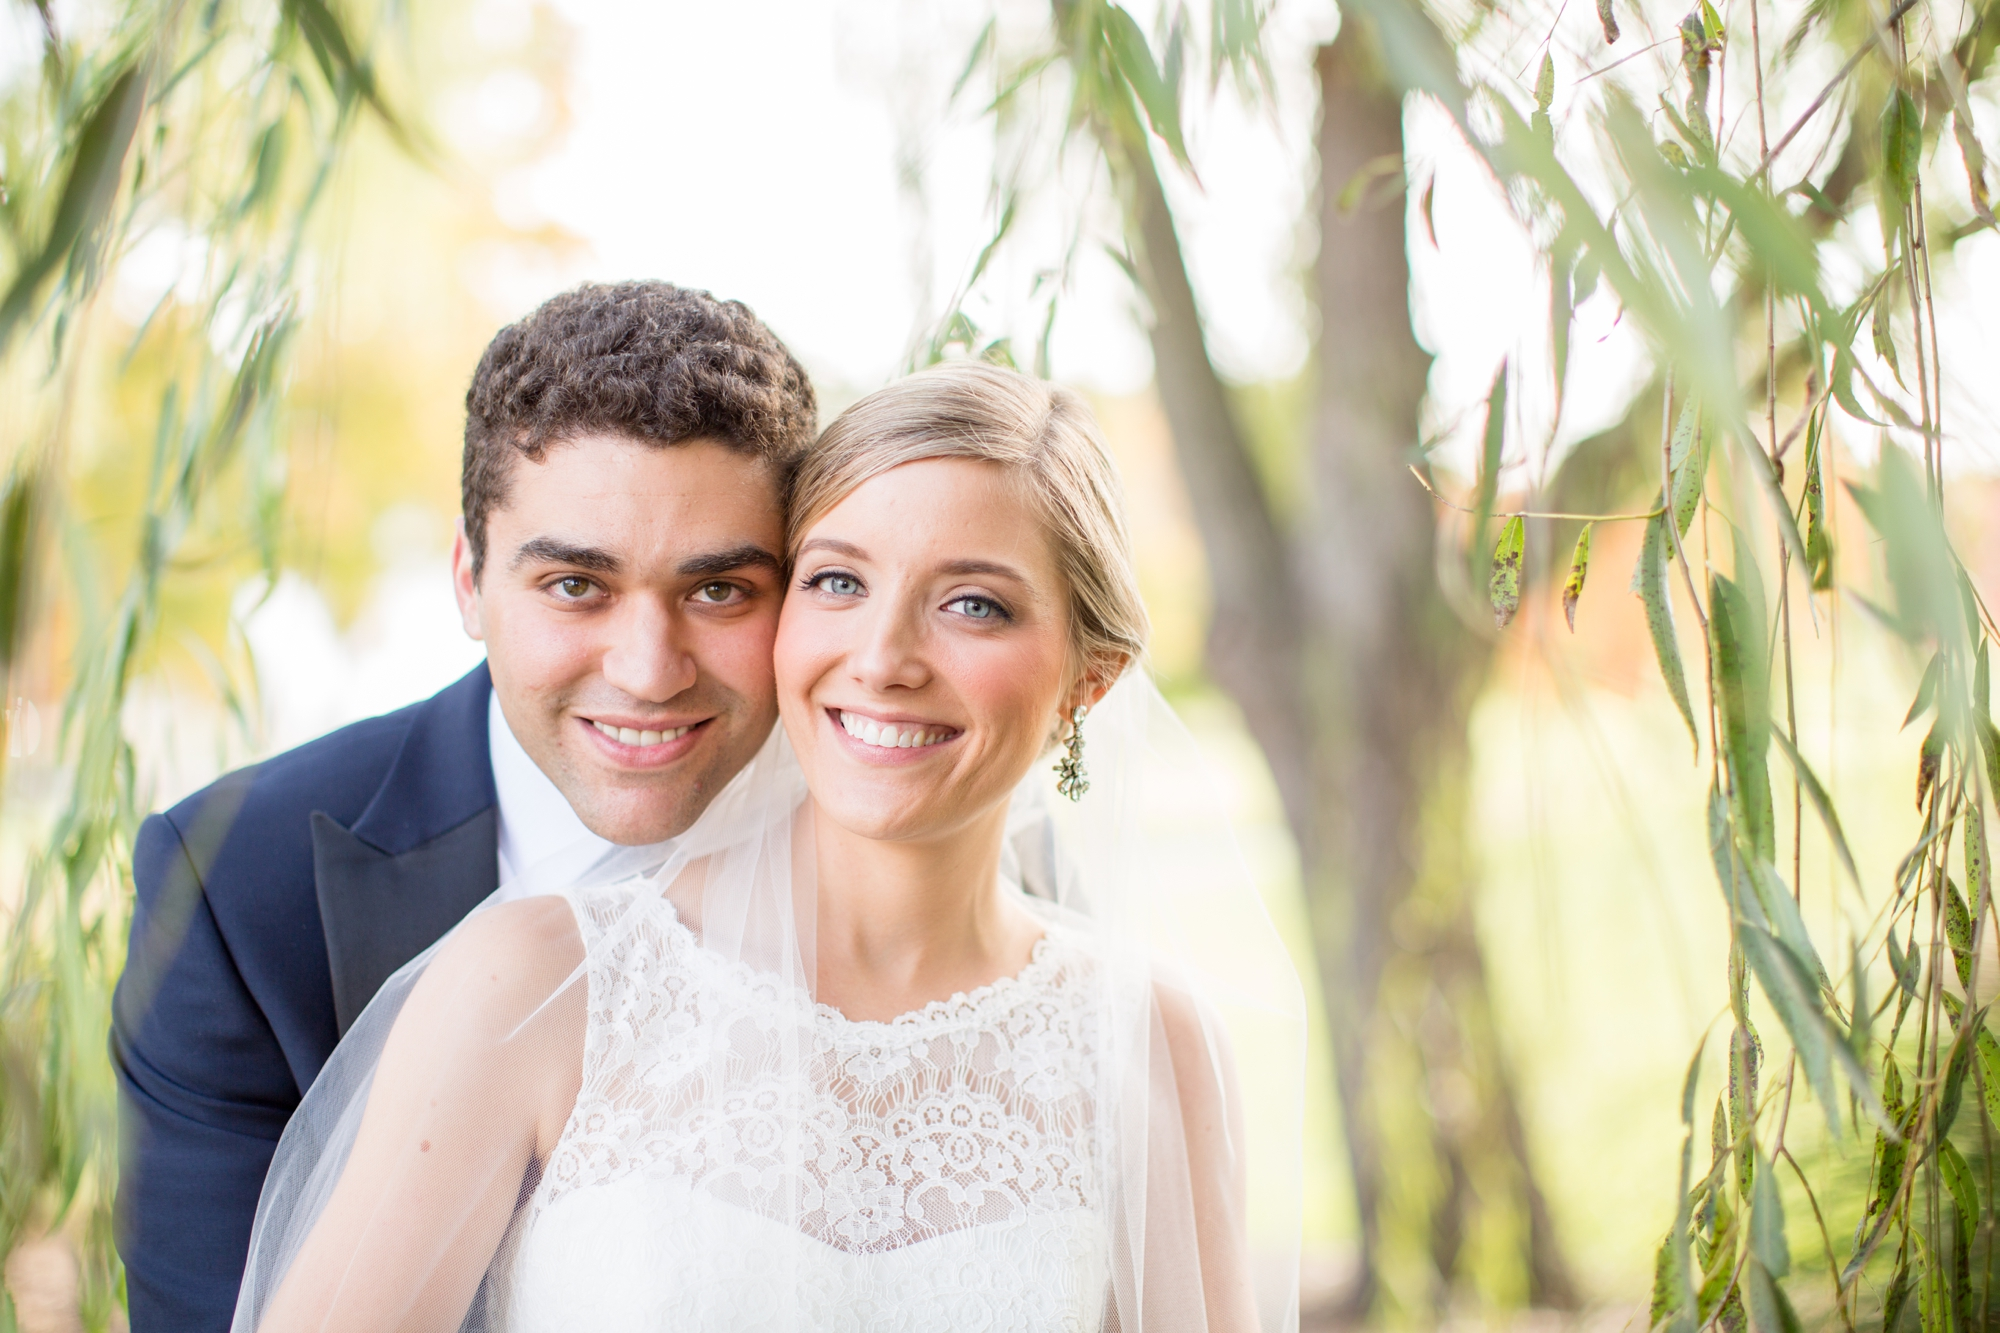 2-Finkel Wedding Bride & Groom Portraits-246_anna grace photography maryland wedding photographer turf valley.jpg